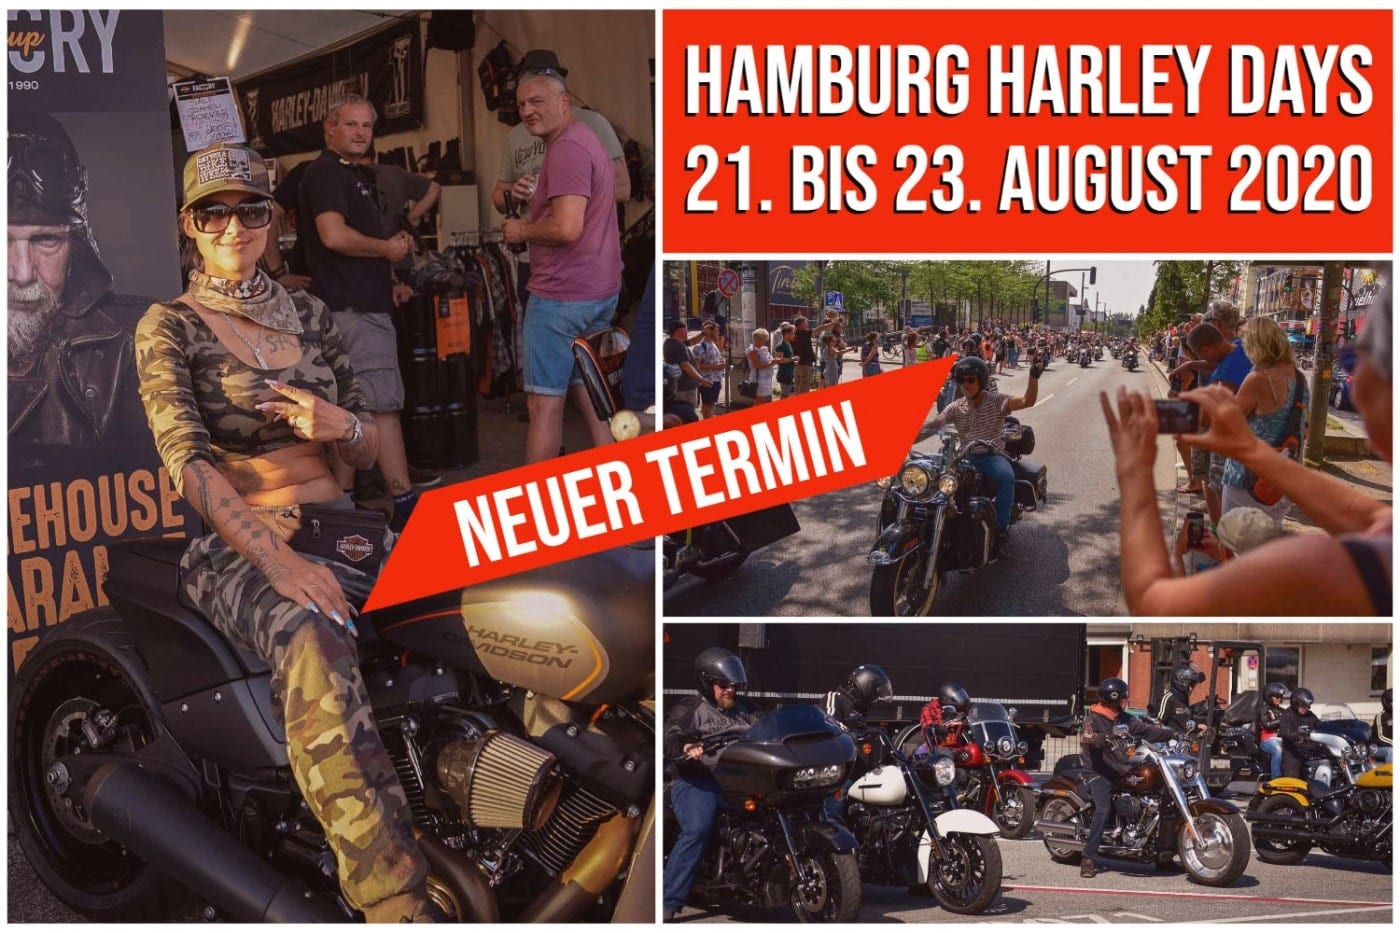 Neuer Termin - Hamburg Harley Days 2020